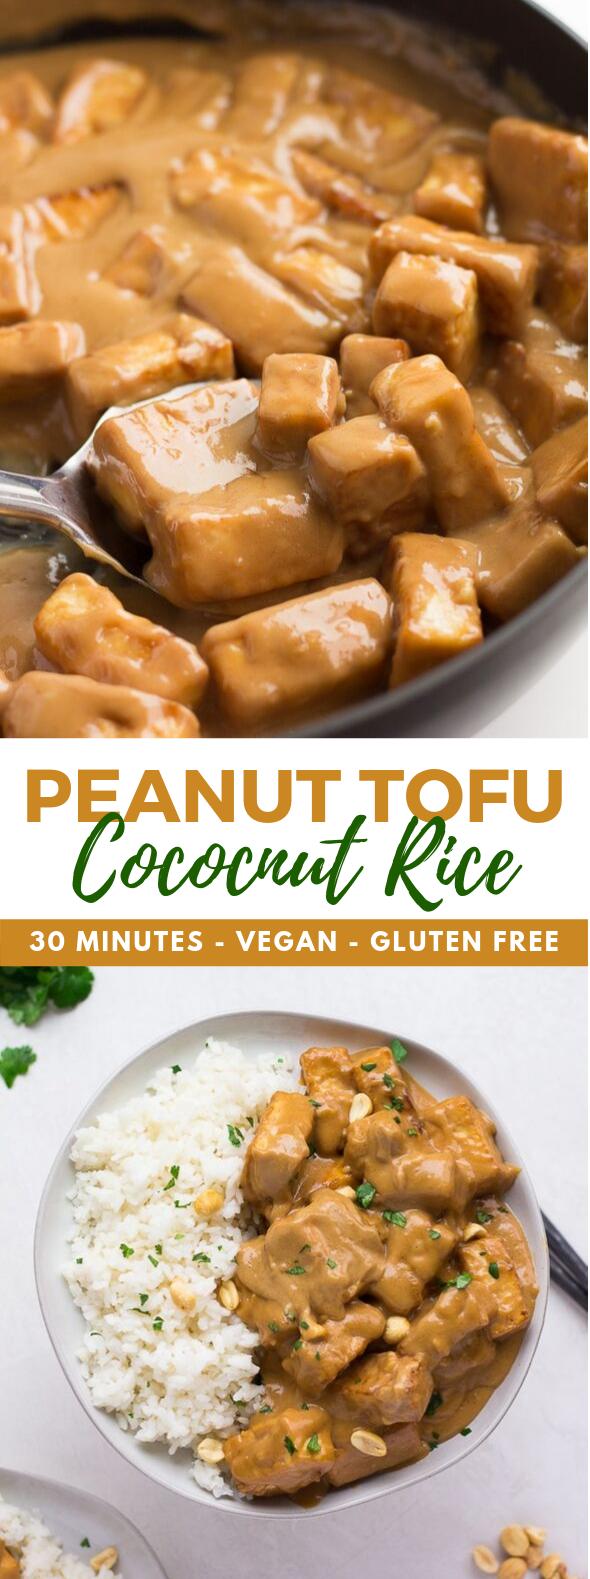 PEANUT TOFU WITH COCONUT RICE #vegan #vegetarian